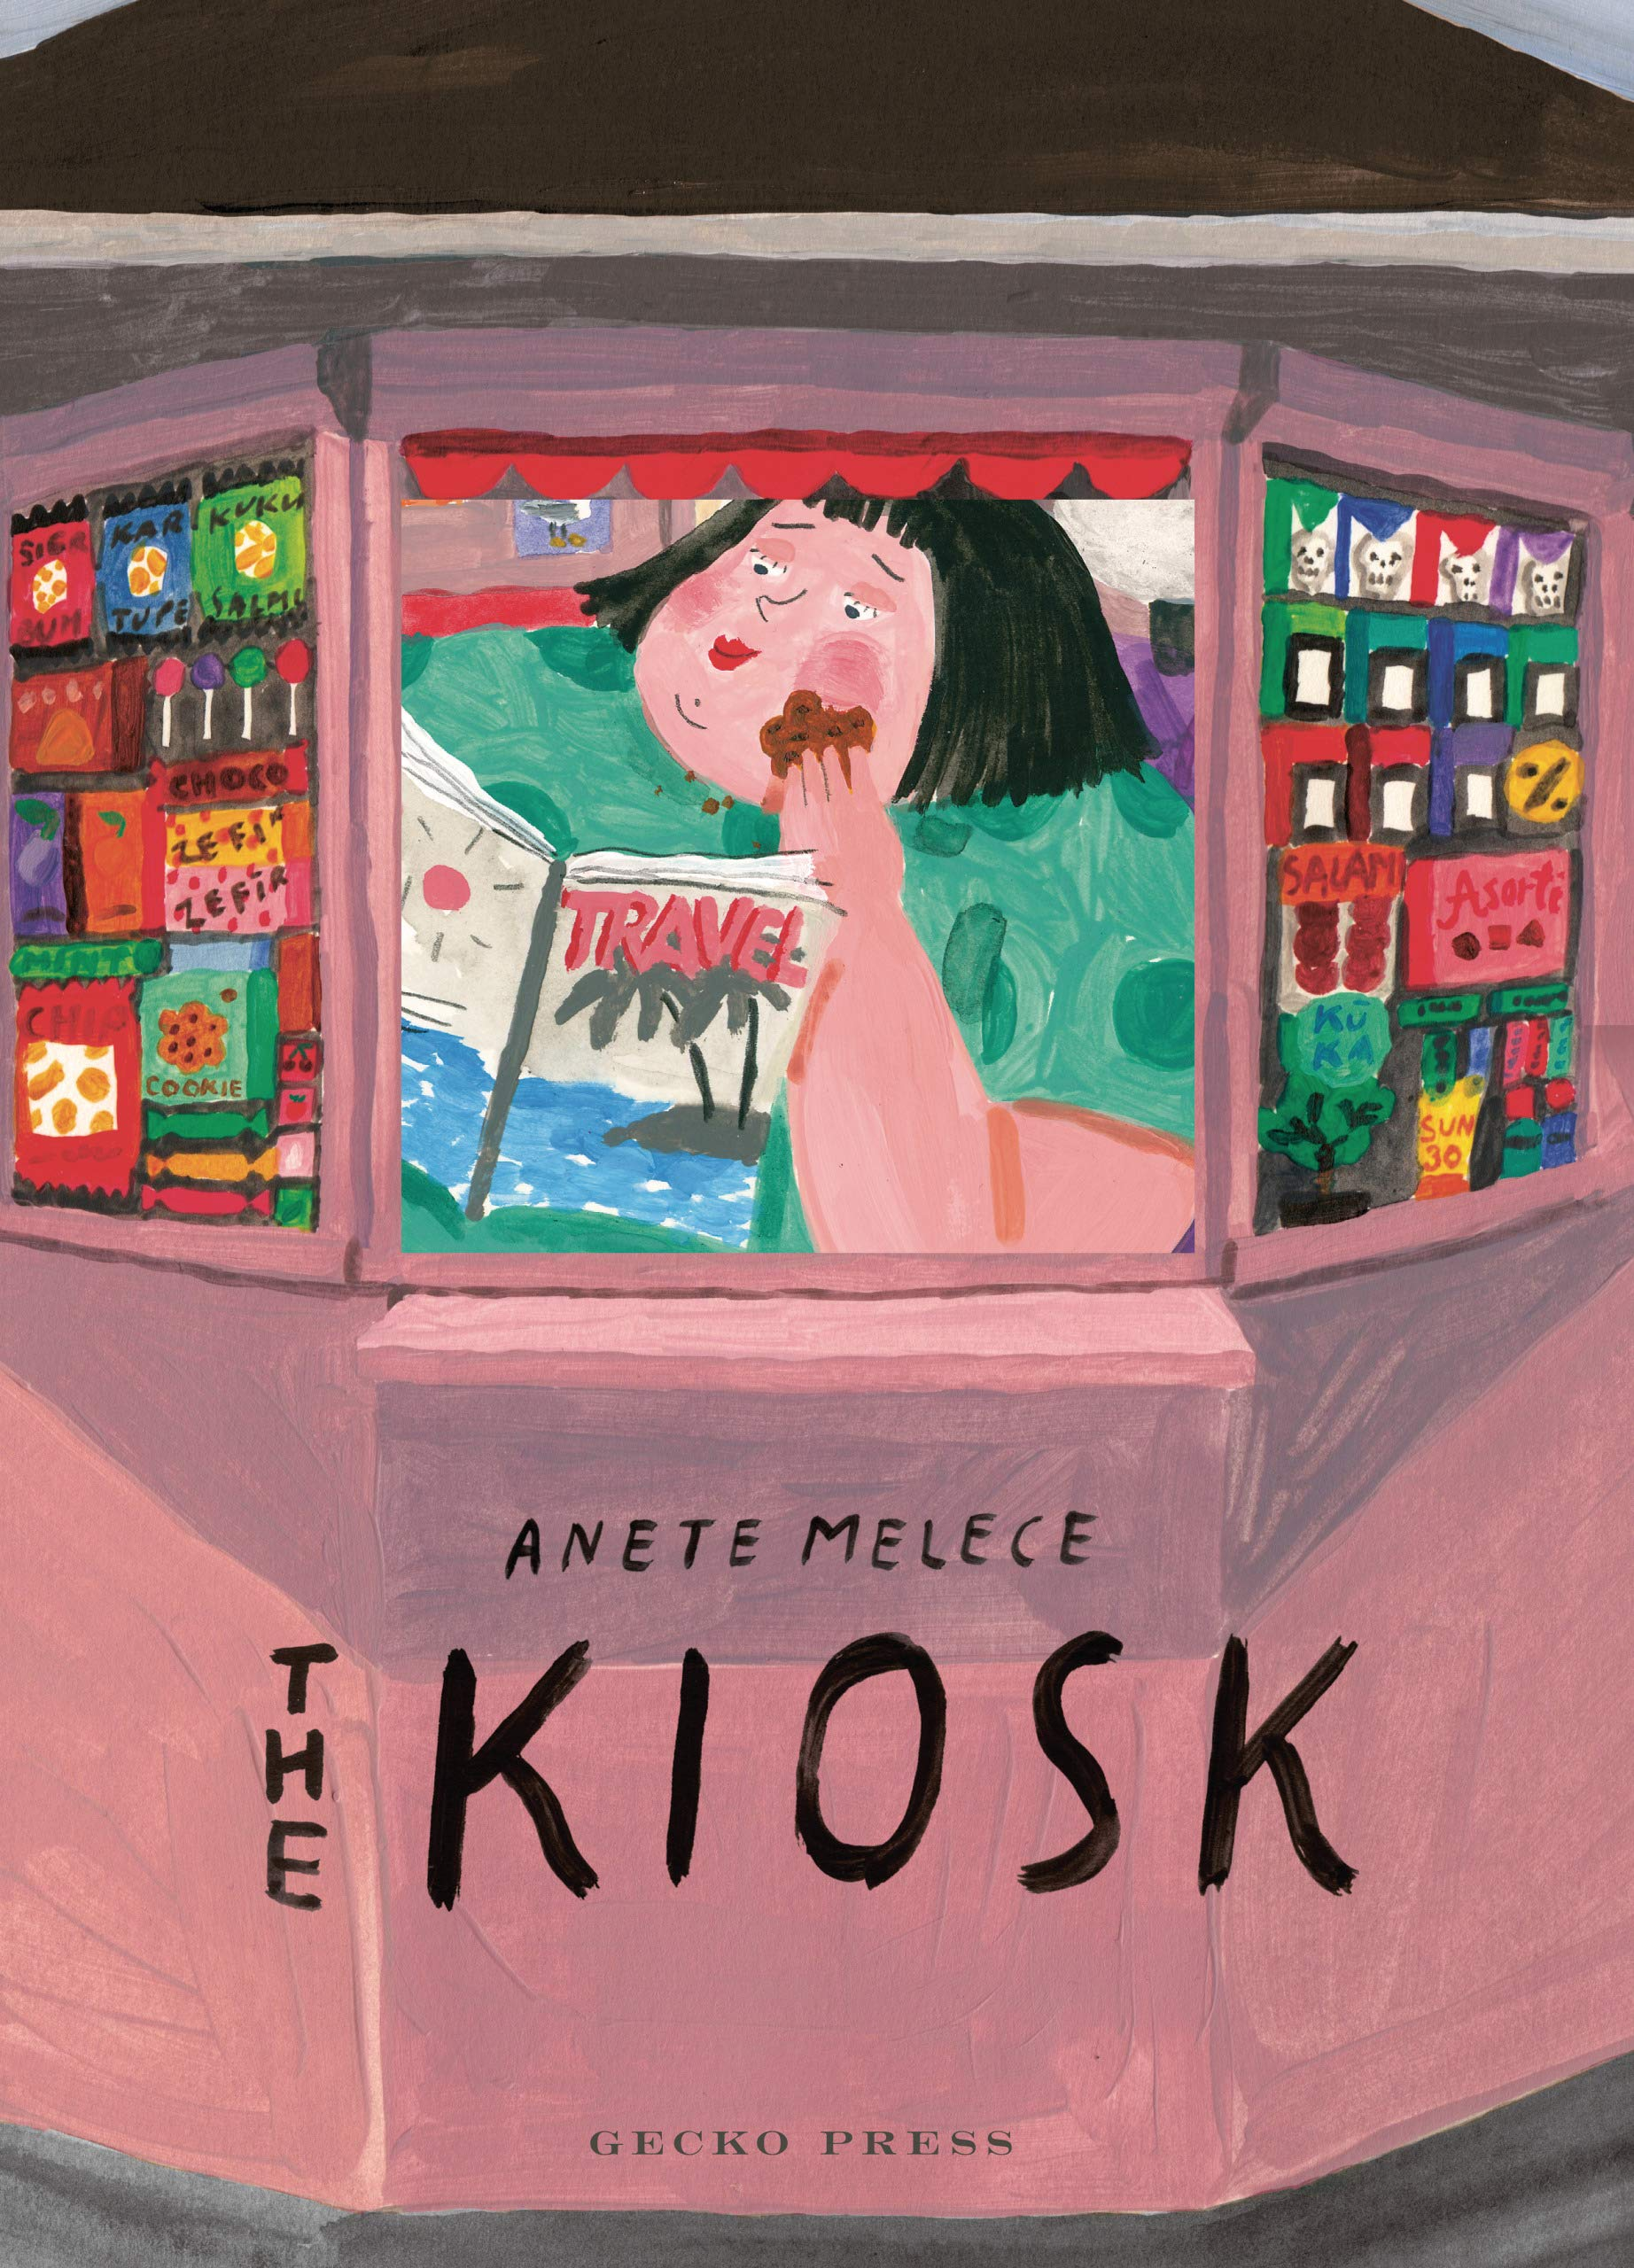 The Kiosk (cover)